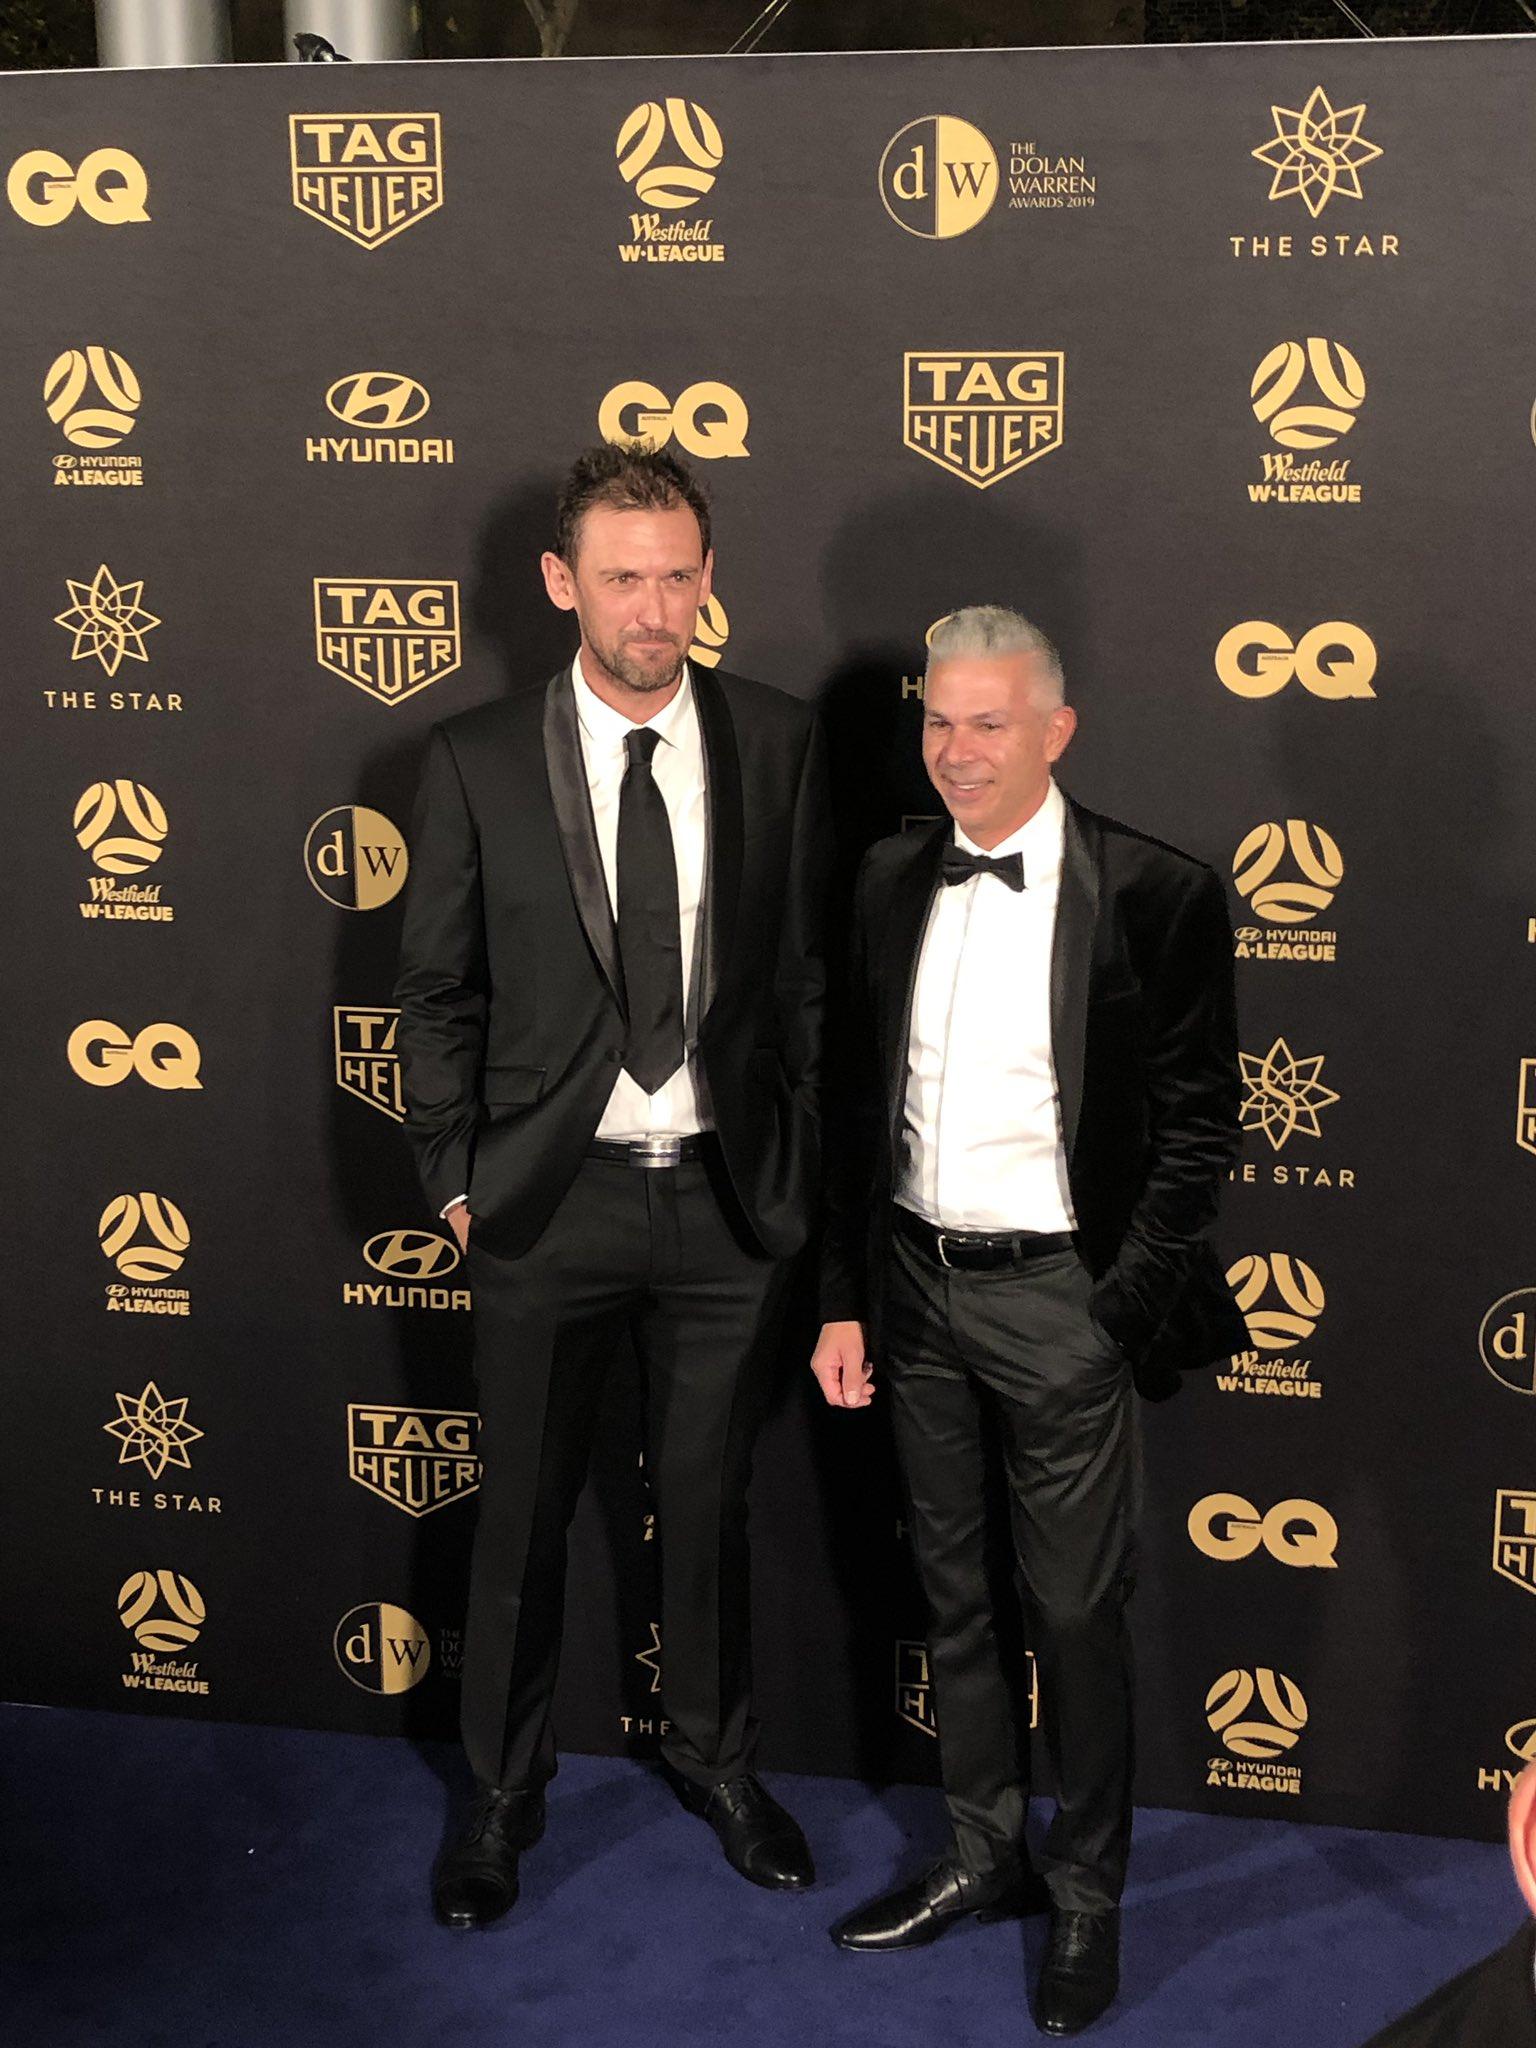 Tony Popovic and Steve Corica